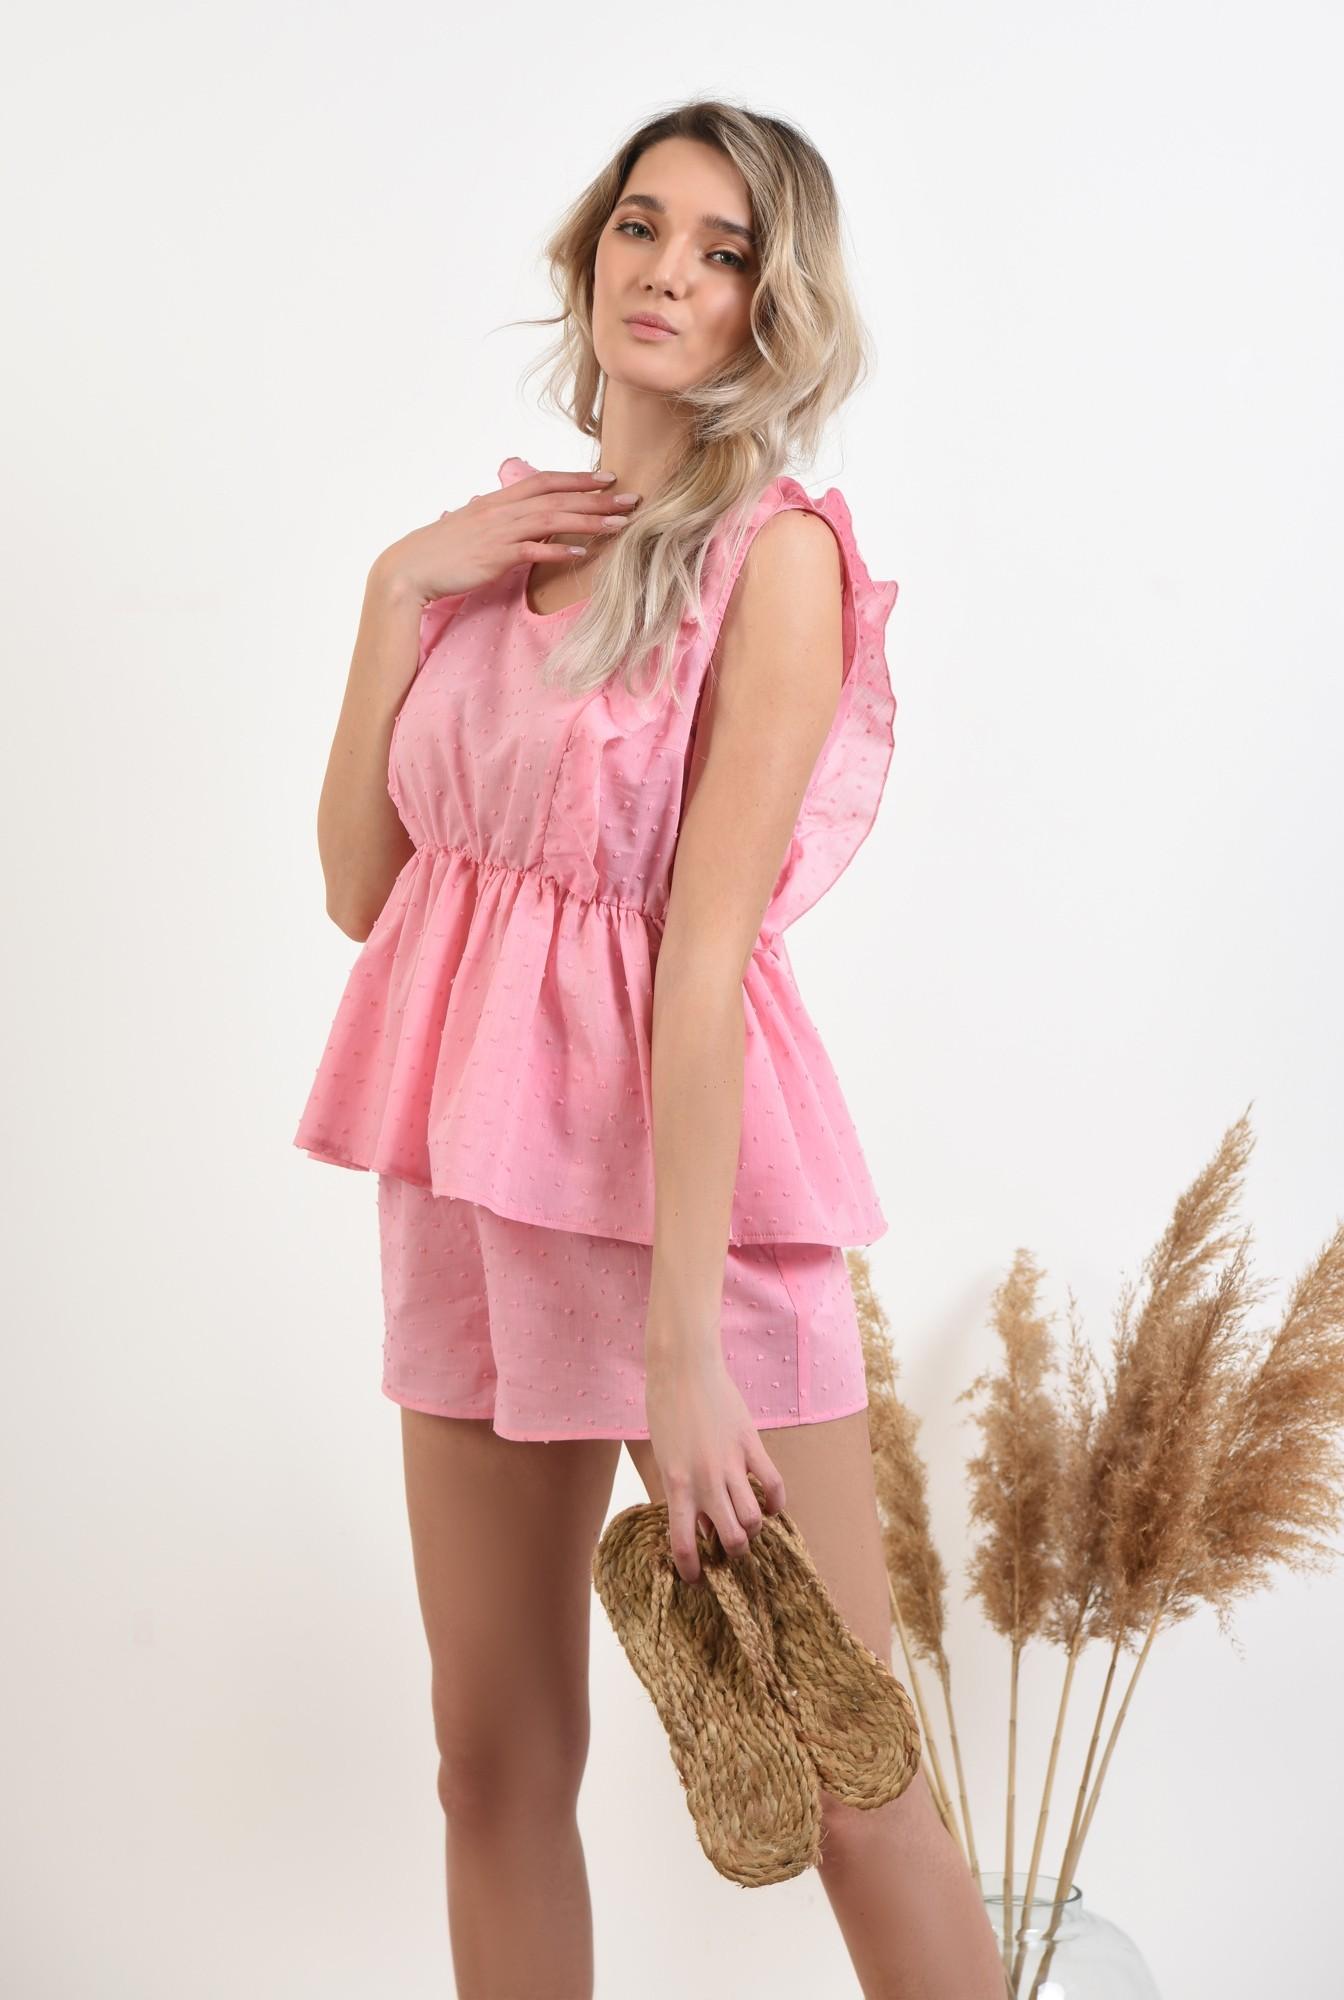 0 - 360 - pantaloni scurti, casual, plumeti, roz, sort plumeti